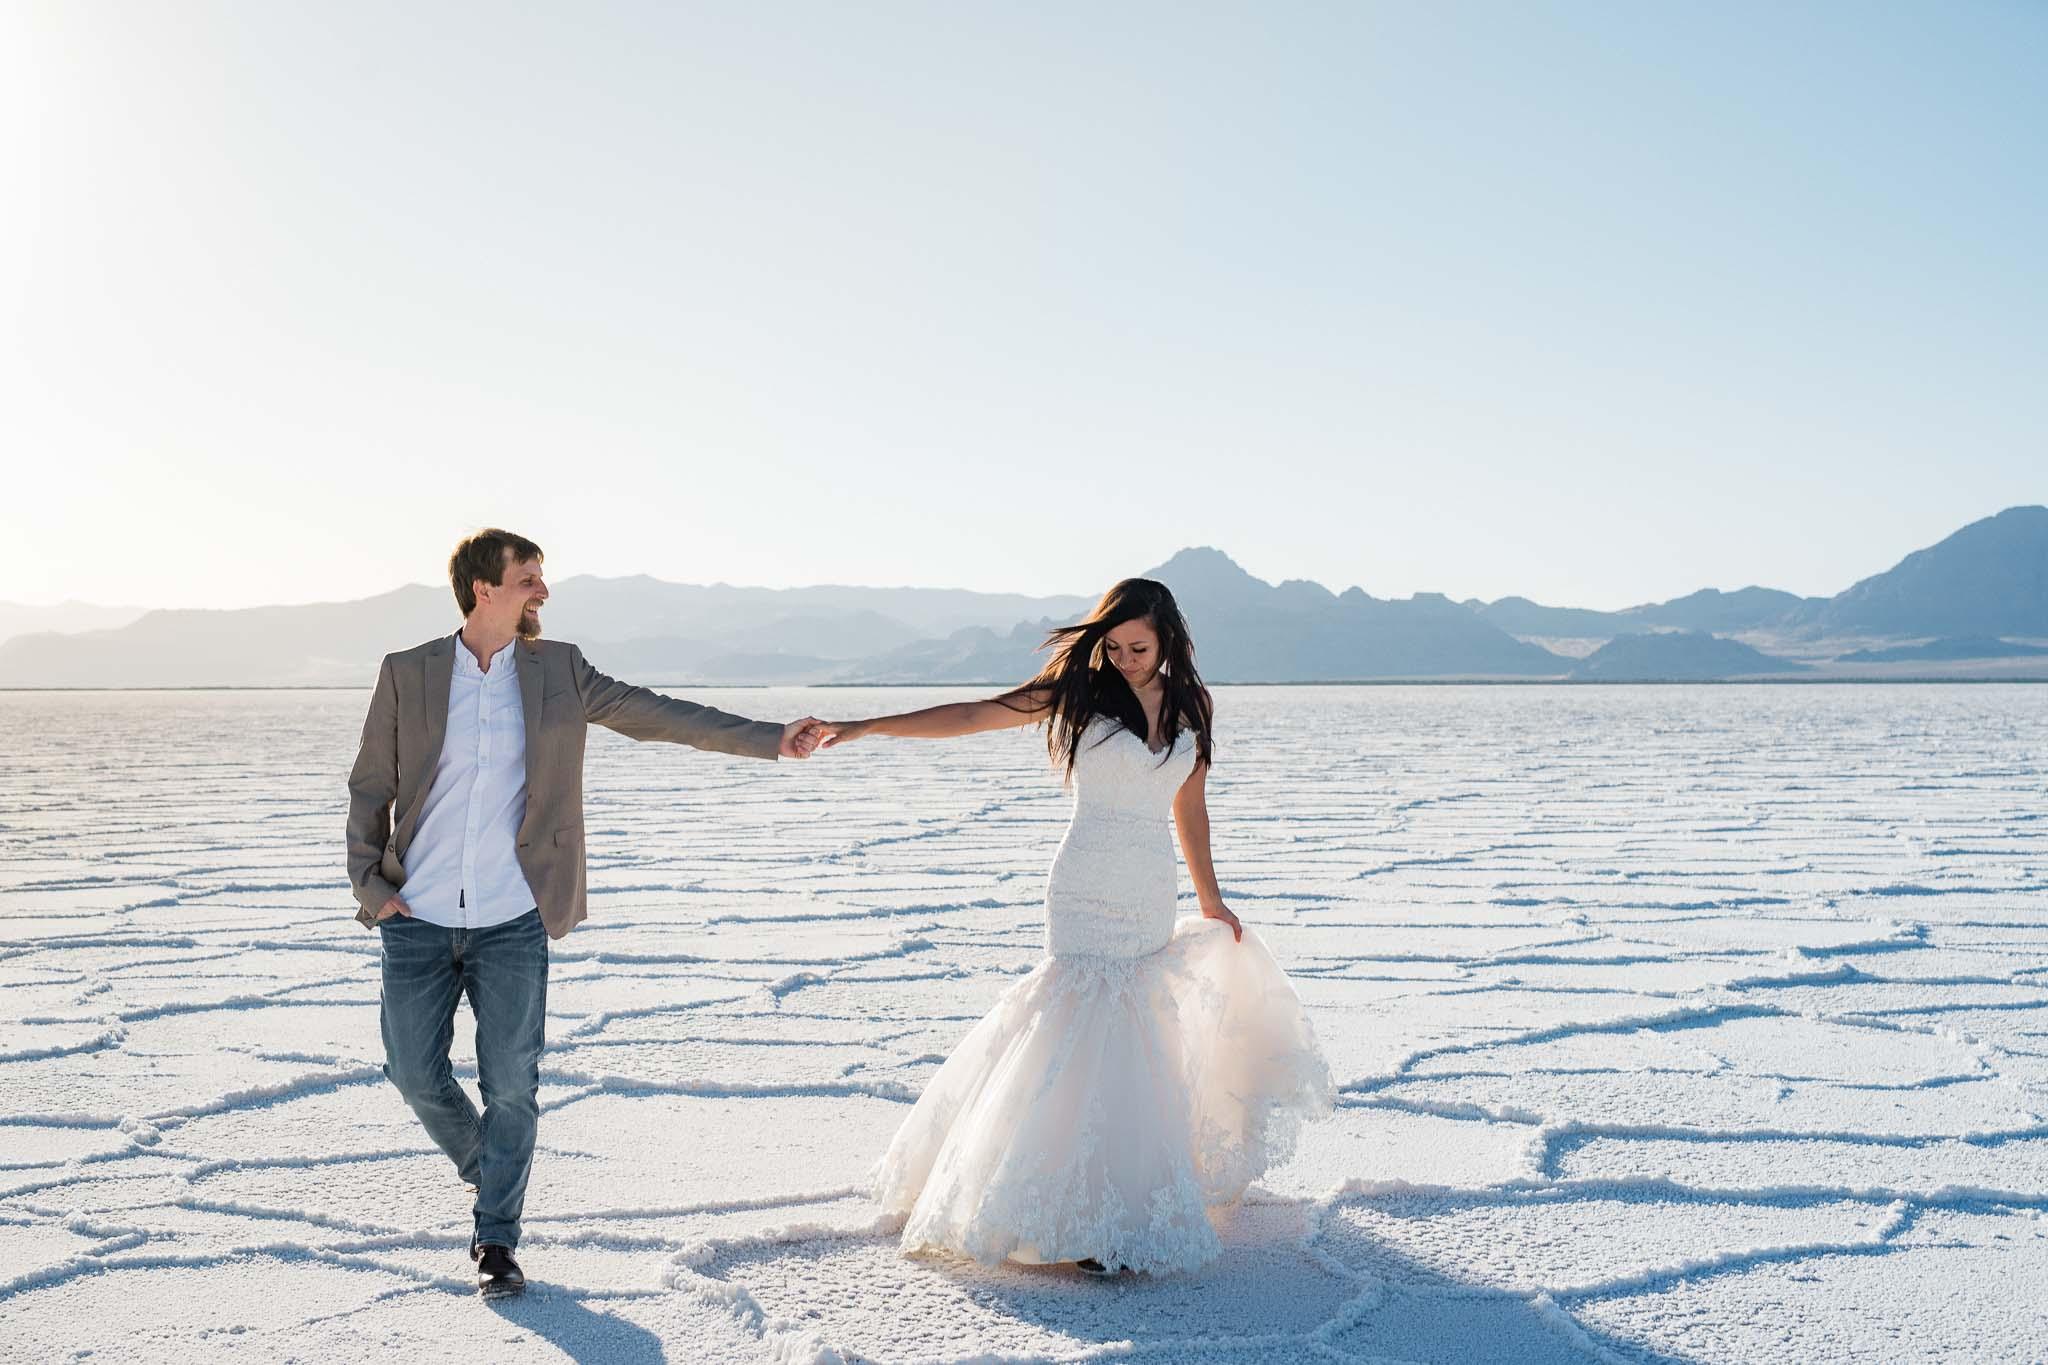 Groom holds bride at the Bonneville Salt Flats, Utah